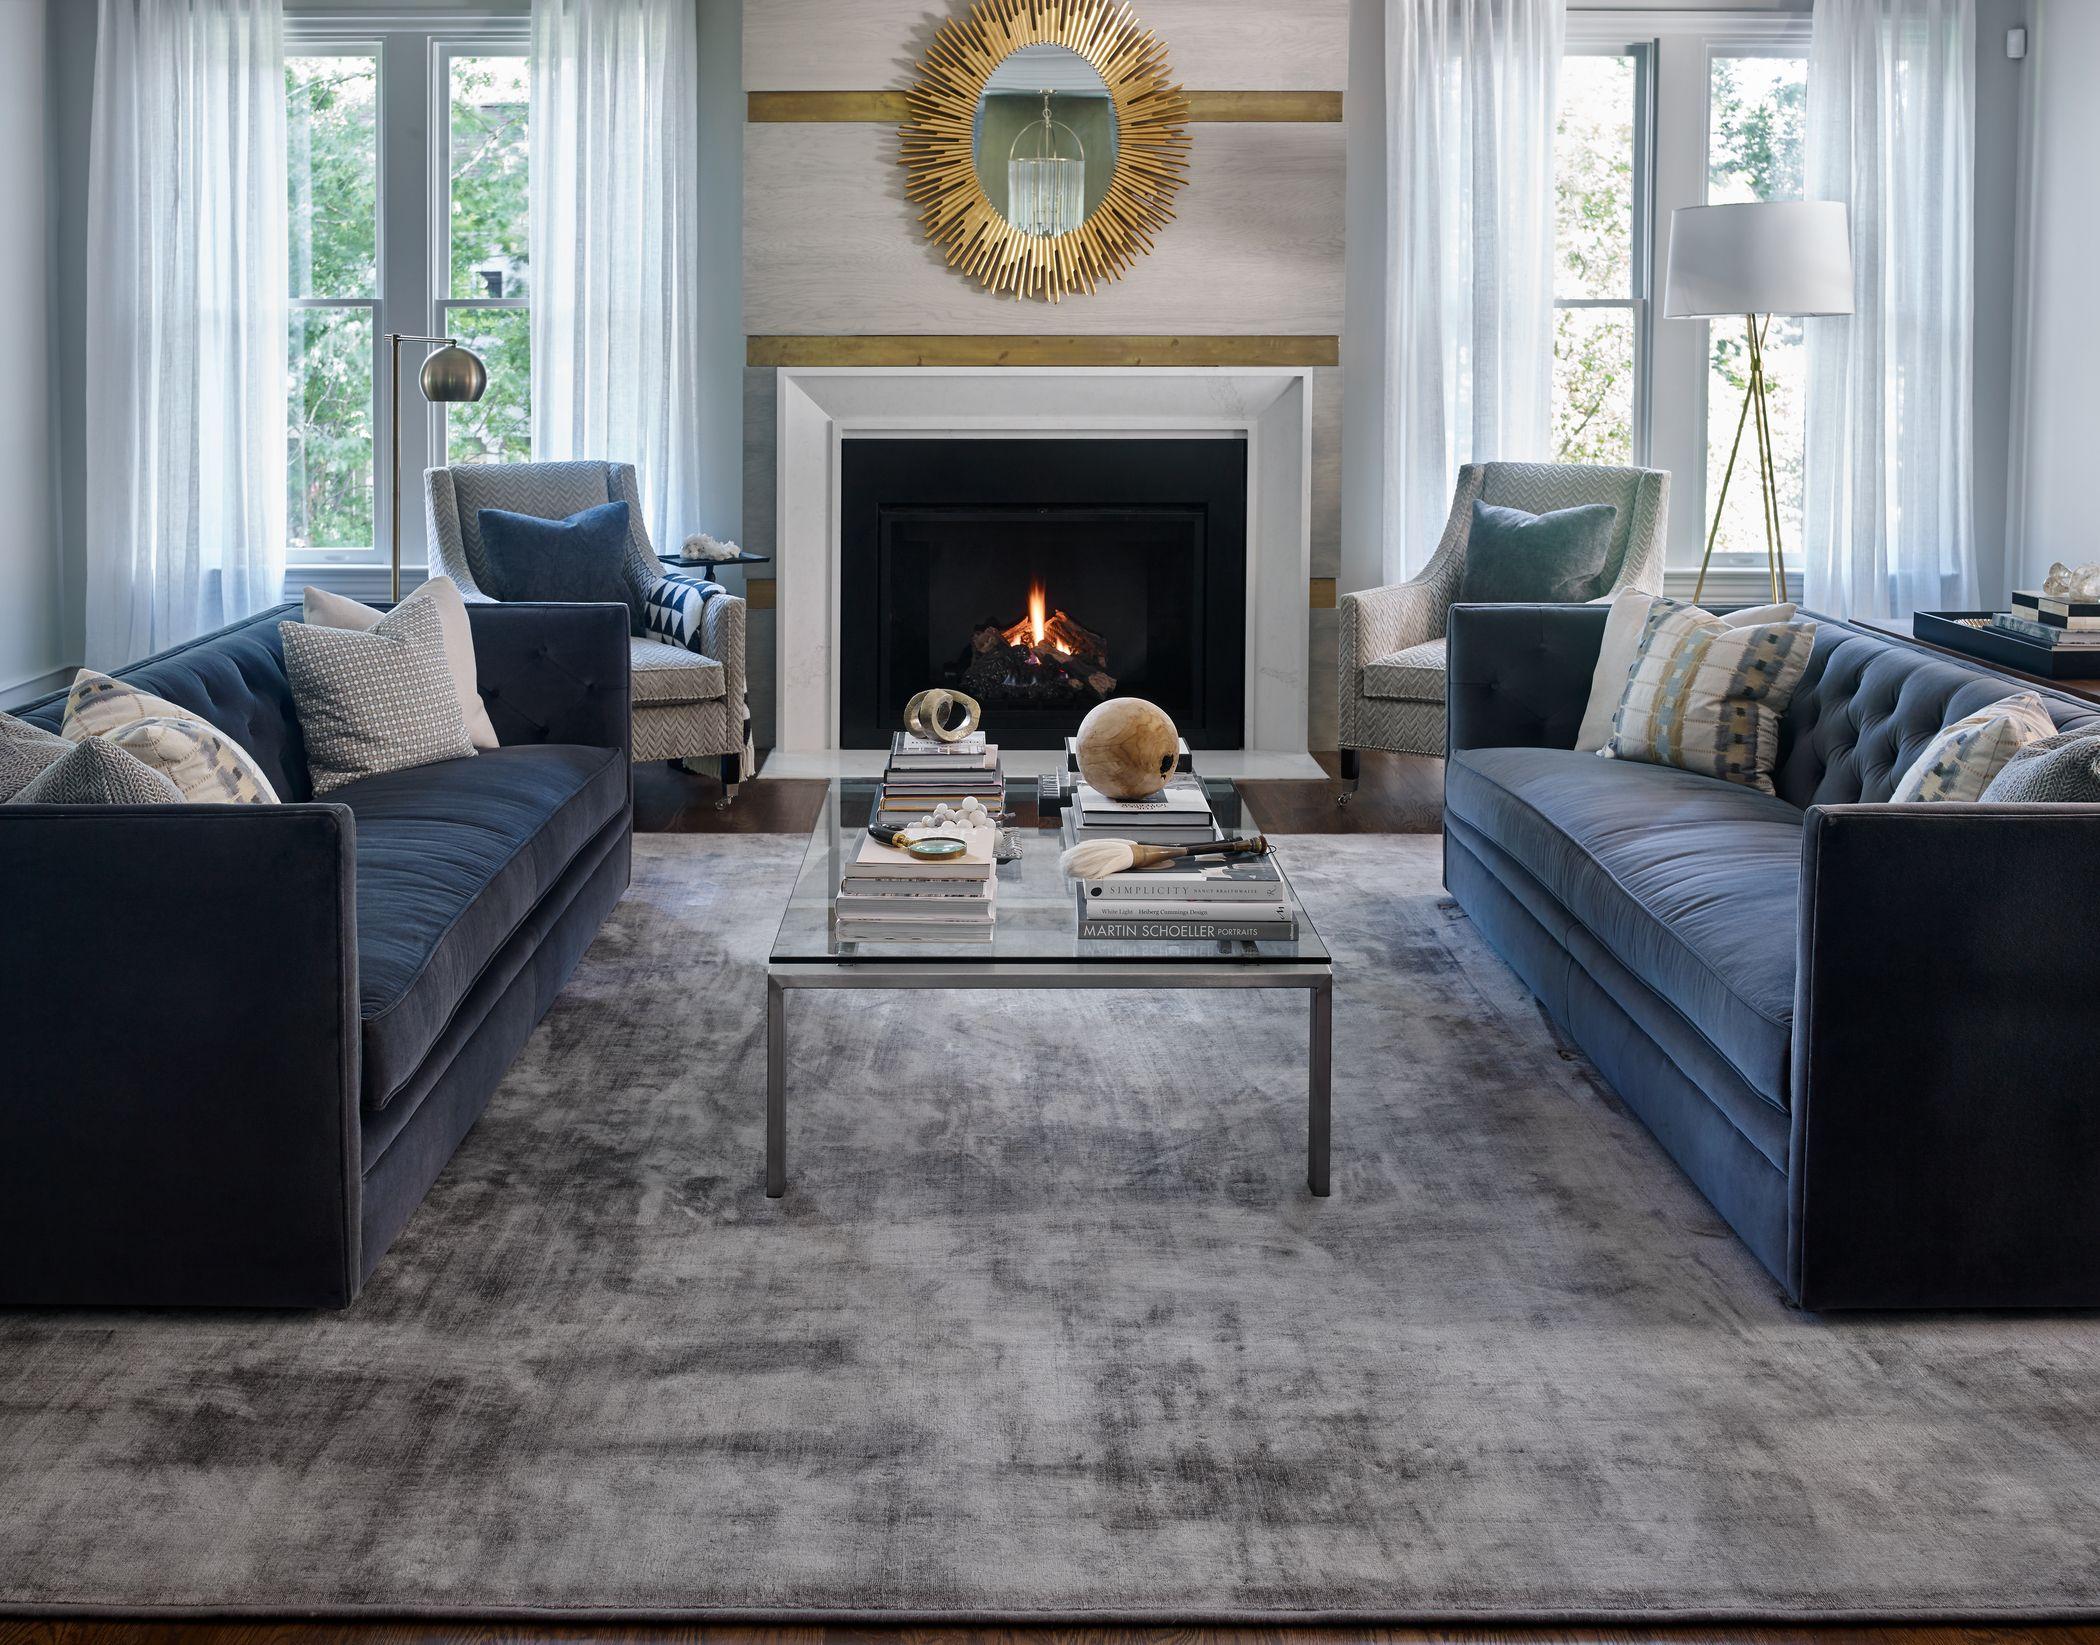 Rosecore's Supreme Bliss Stanton Carpet, Hotel Carpet, Wall Carpet, Rugs On Carpet,